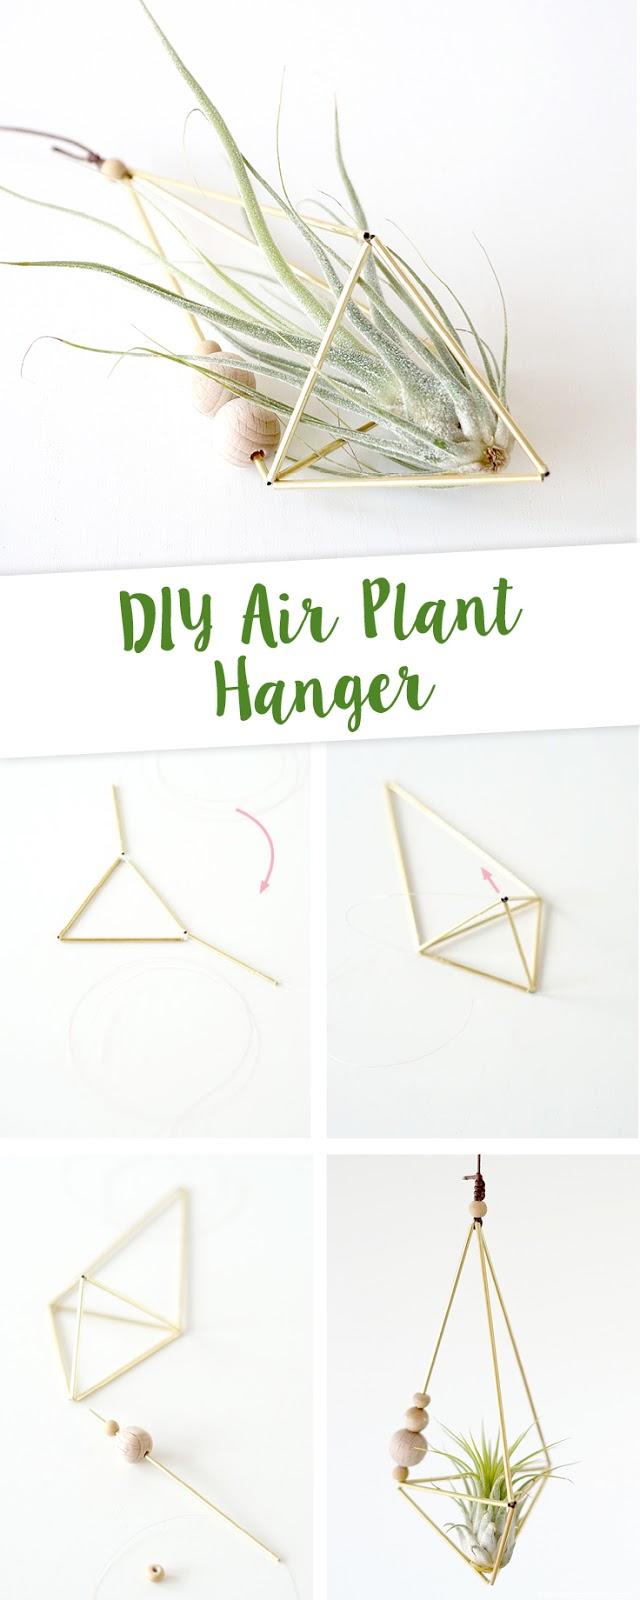 http://www.aentschiesblog.com/2017/04/diy-air-plant-hanger.html